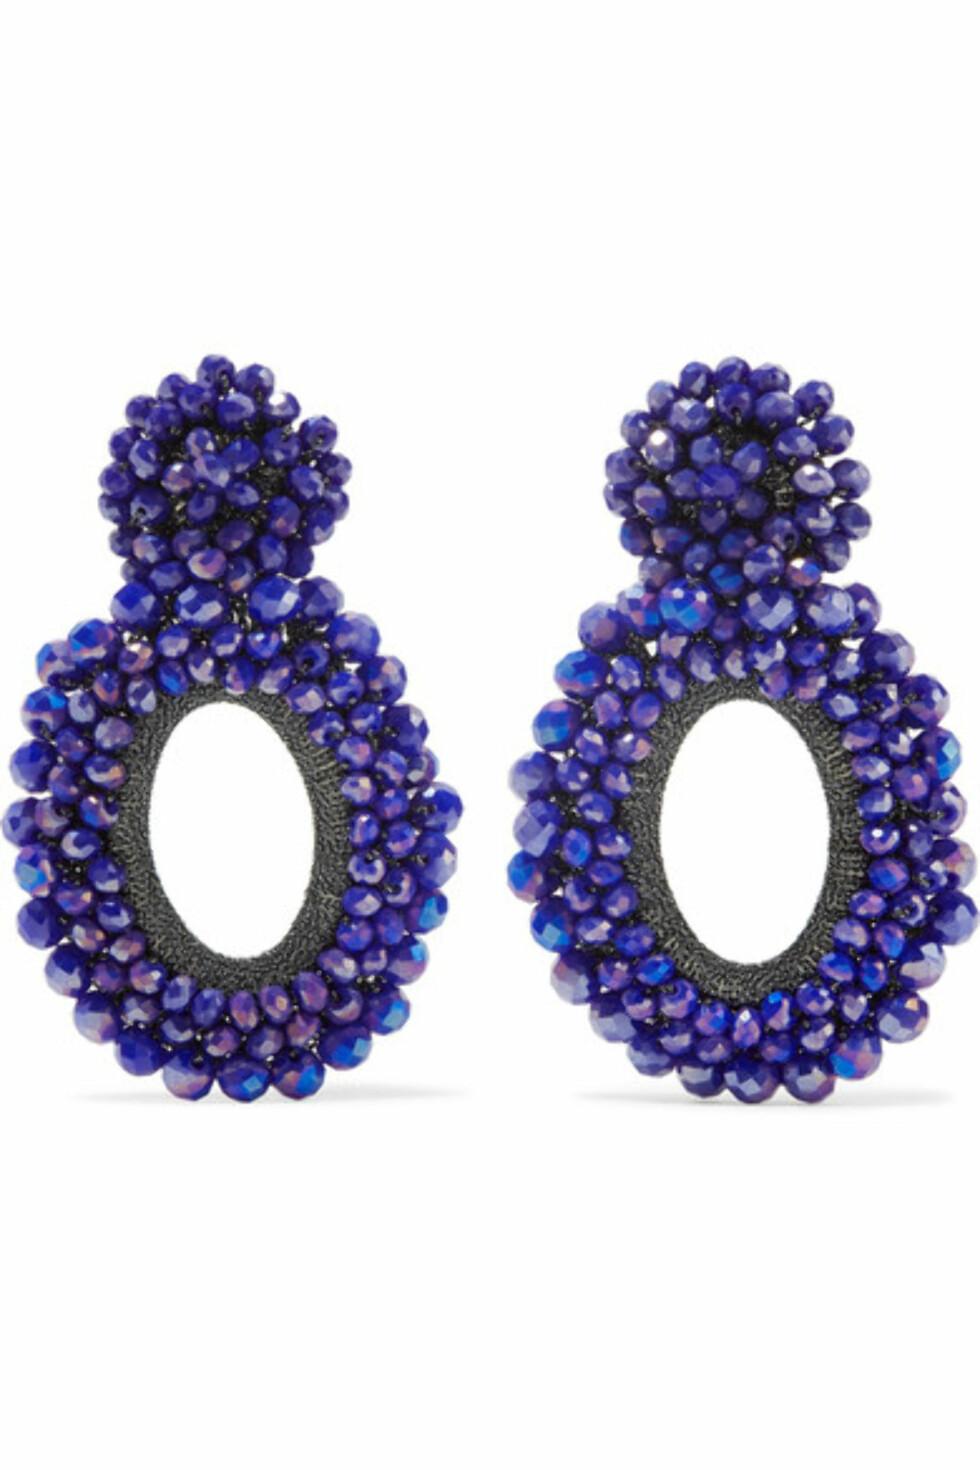 Øredobber fra Bibi Marini via Net-a-porter.com |2900,-| https://www.net-a-porter.com/no/en/product/1039408/bibi_marini/primrose-silver--bead-and-silk-earrings